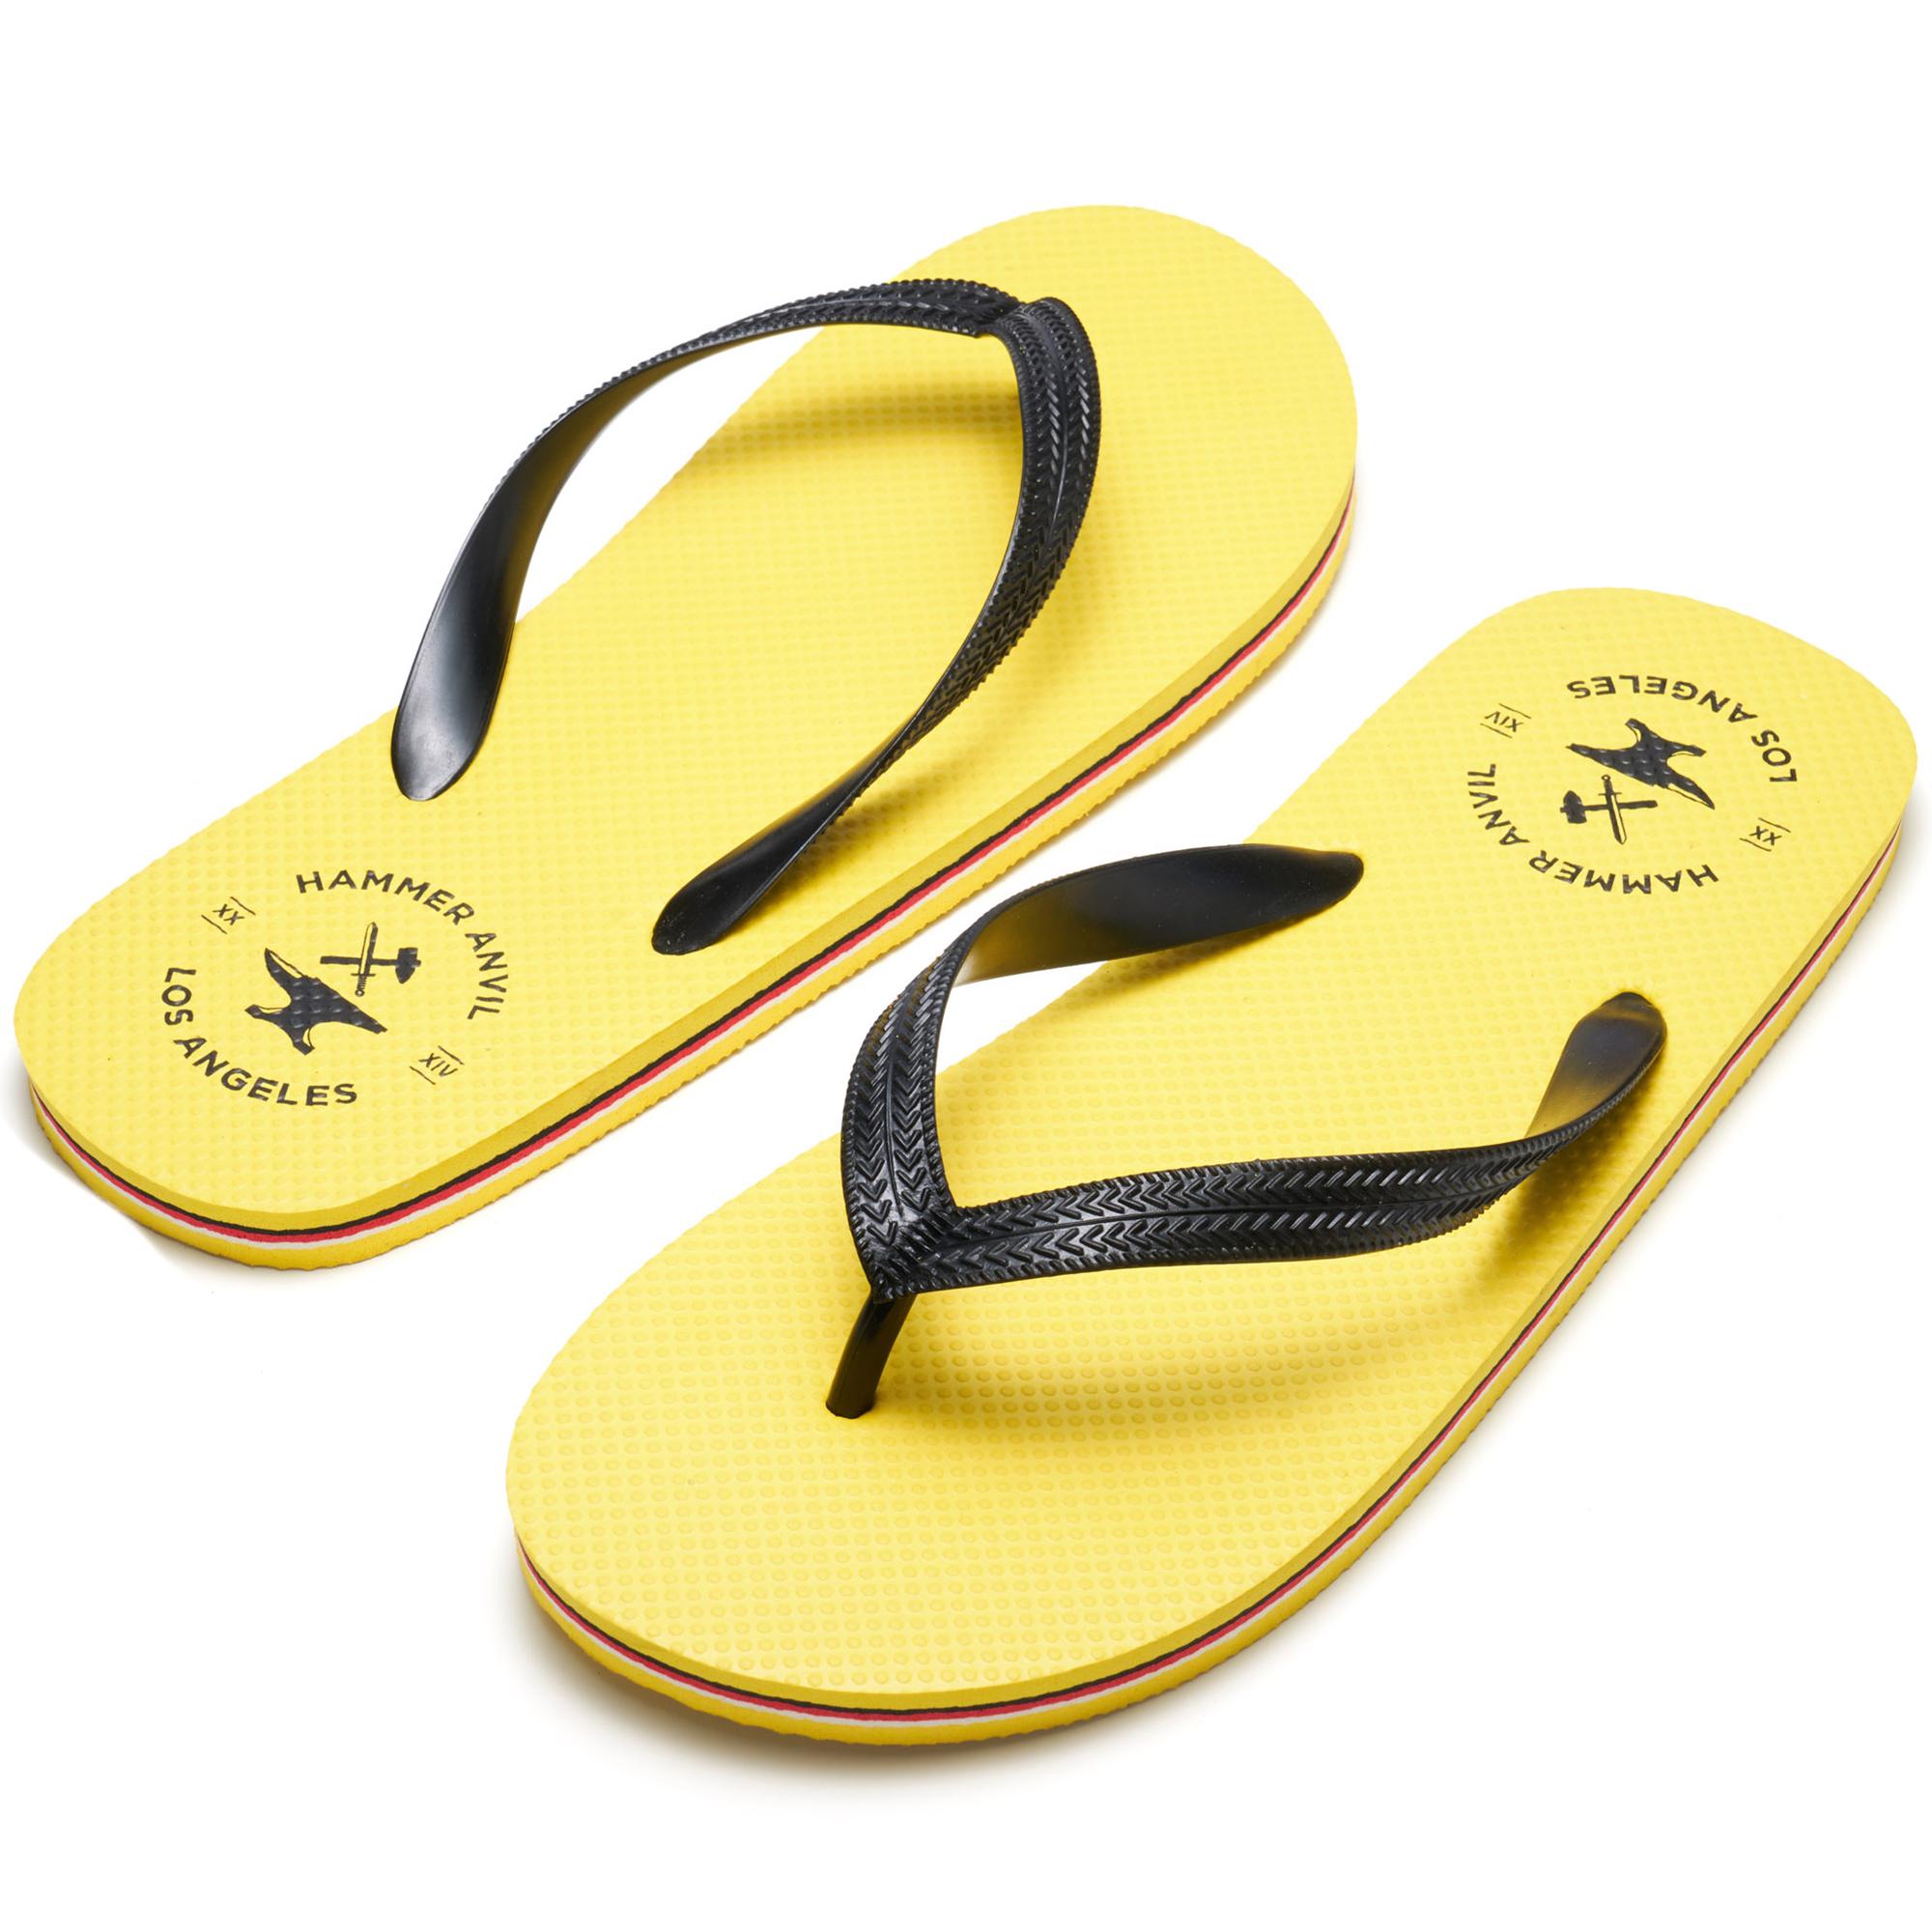 Hammer-Anvil-Mens-Flip-Flops-Casual-Thong-Summer-Sandals-Comfortable-Beach-Shoes thumbnail 48